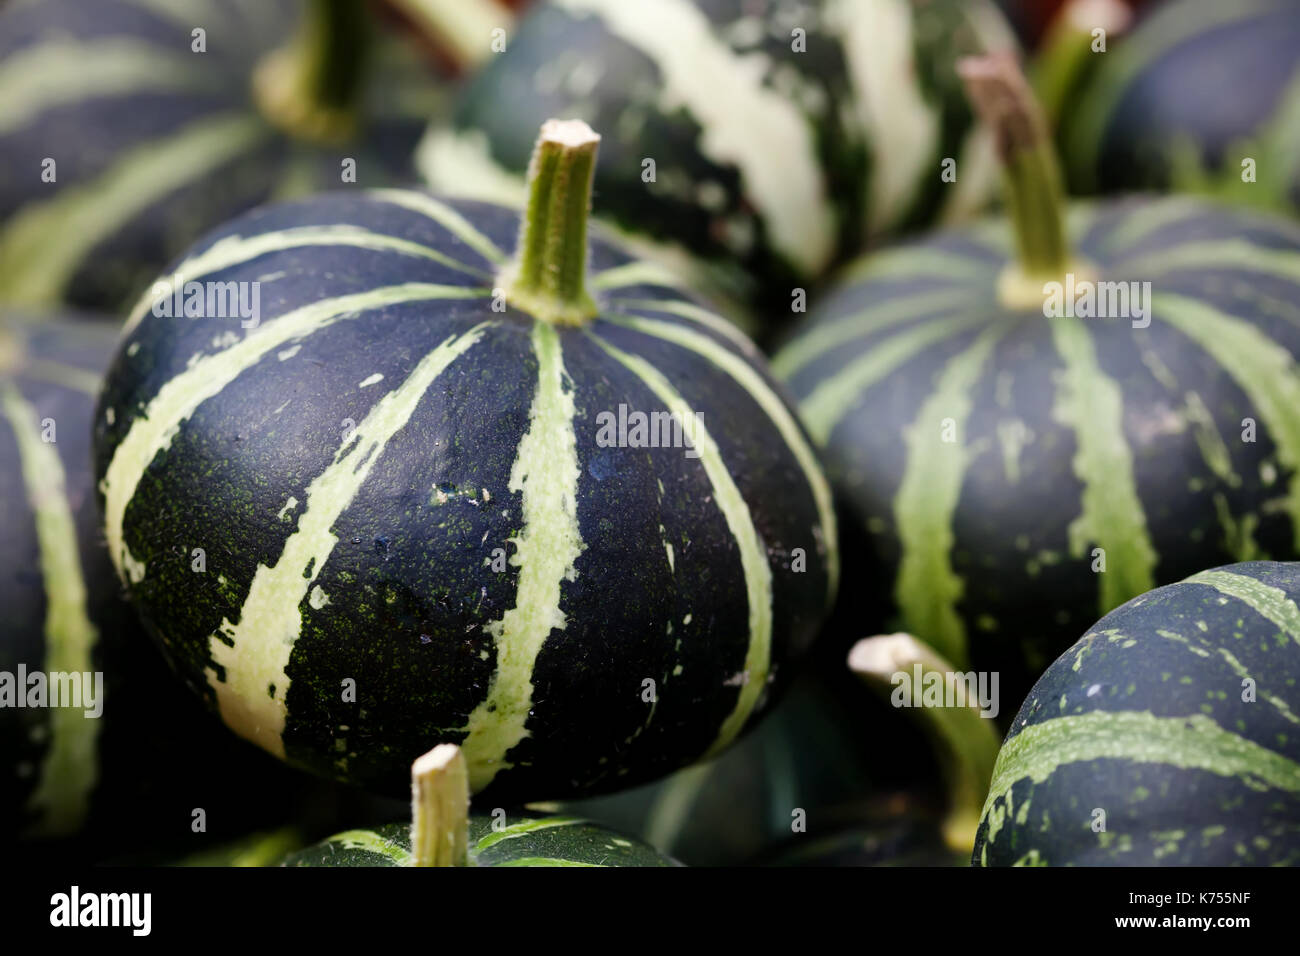 Striped green pumpkins halloween background. Organic vegetables still life. Shallow depth of field photo - Stock Image